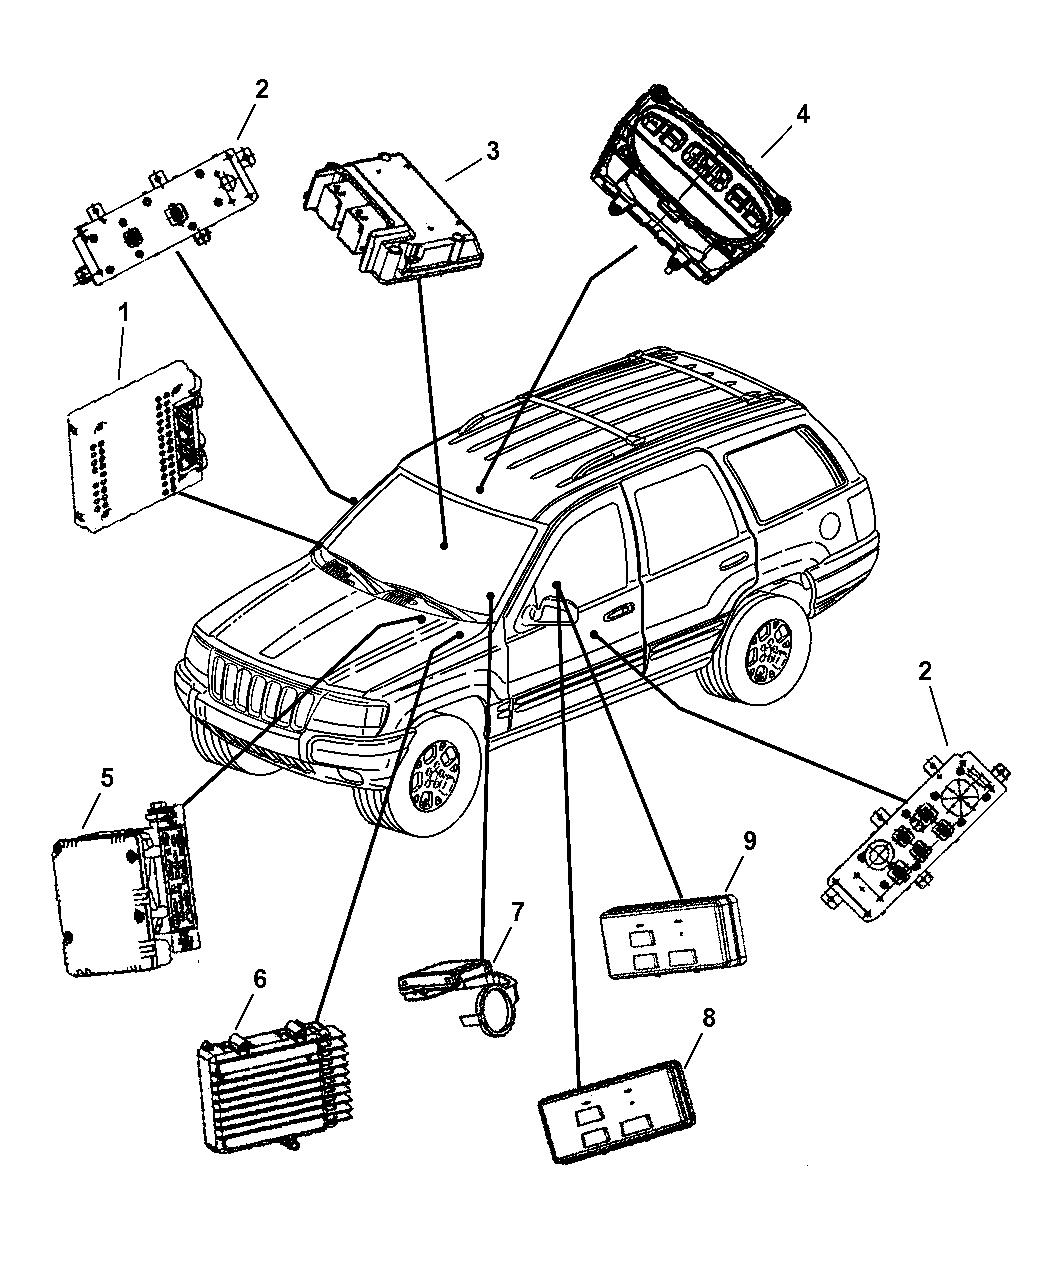 56042498AM - Genuine Jeep MODULE-BODY CONTROLLER